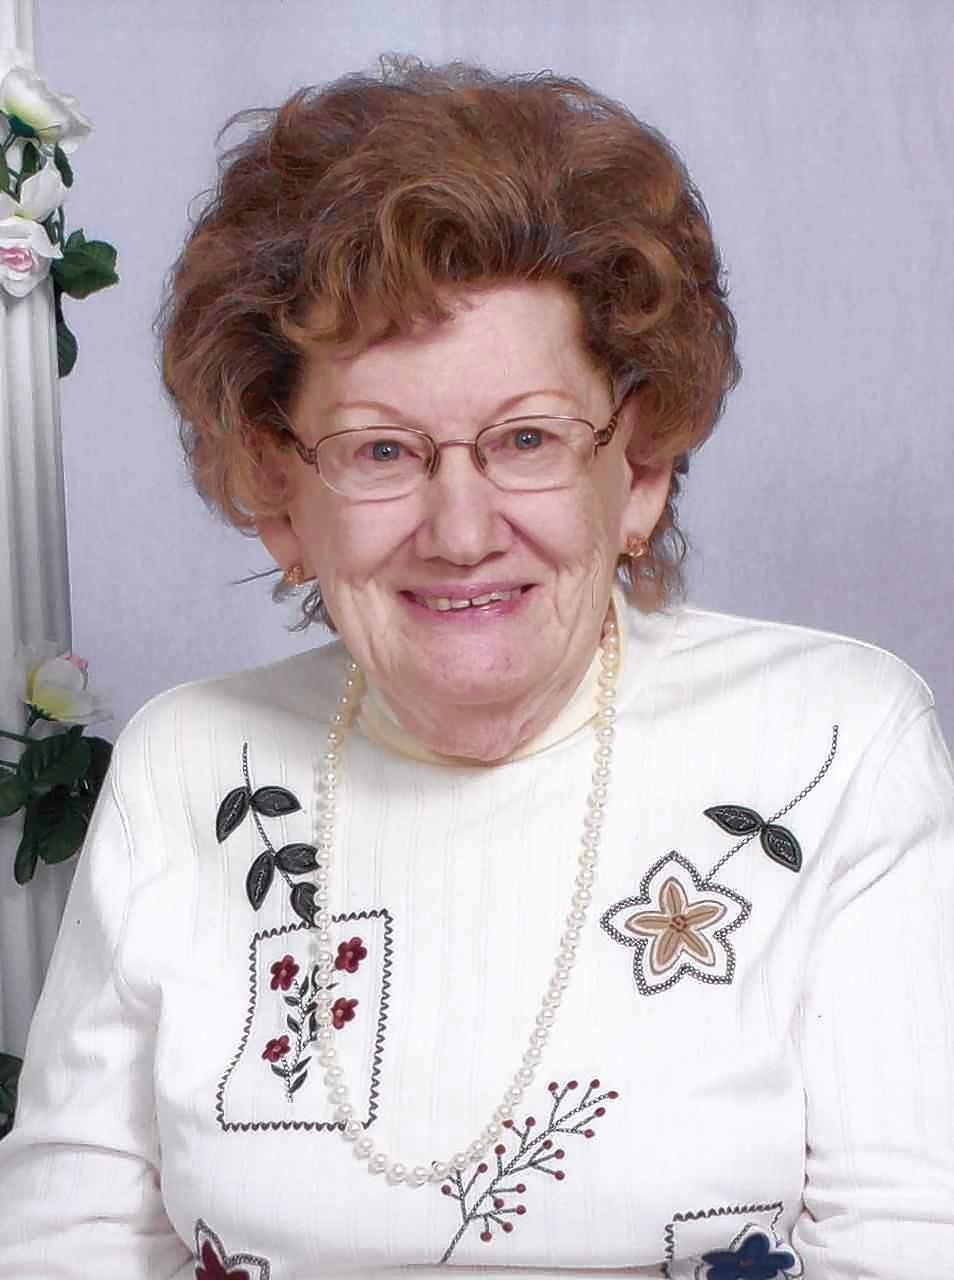 Janet Phyllis Cavins